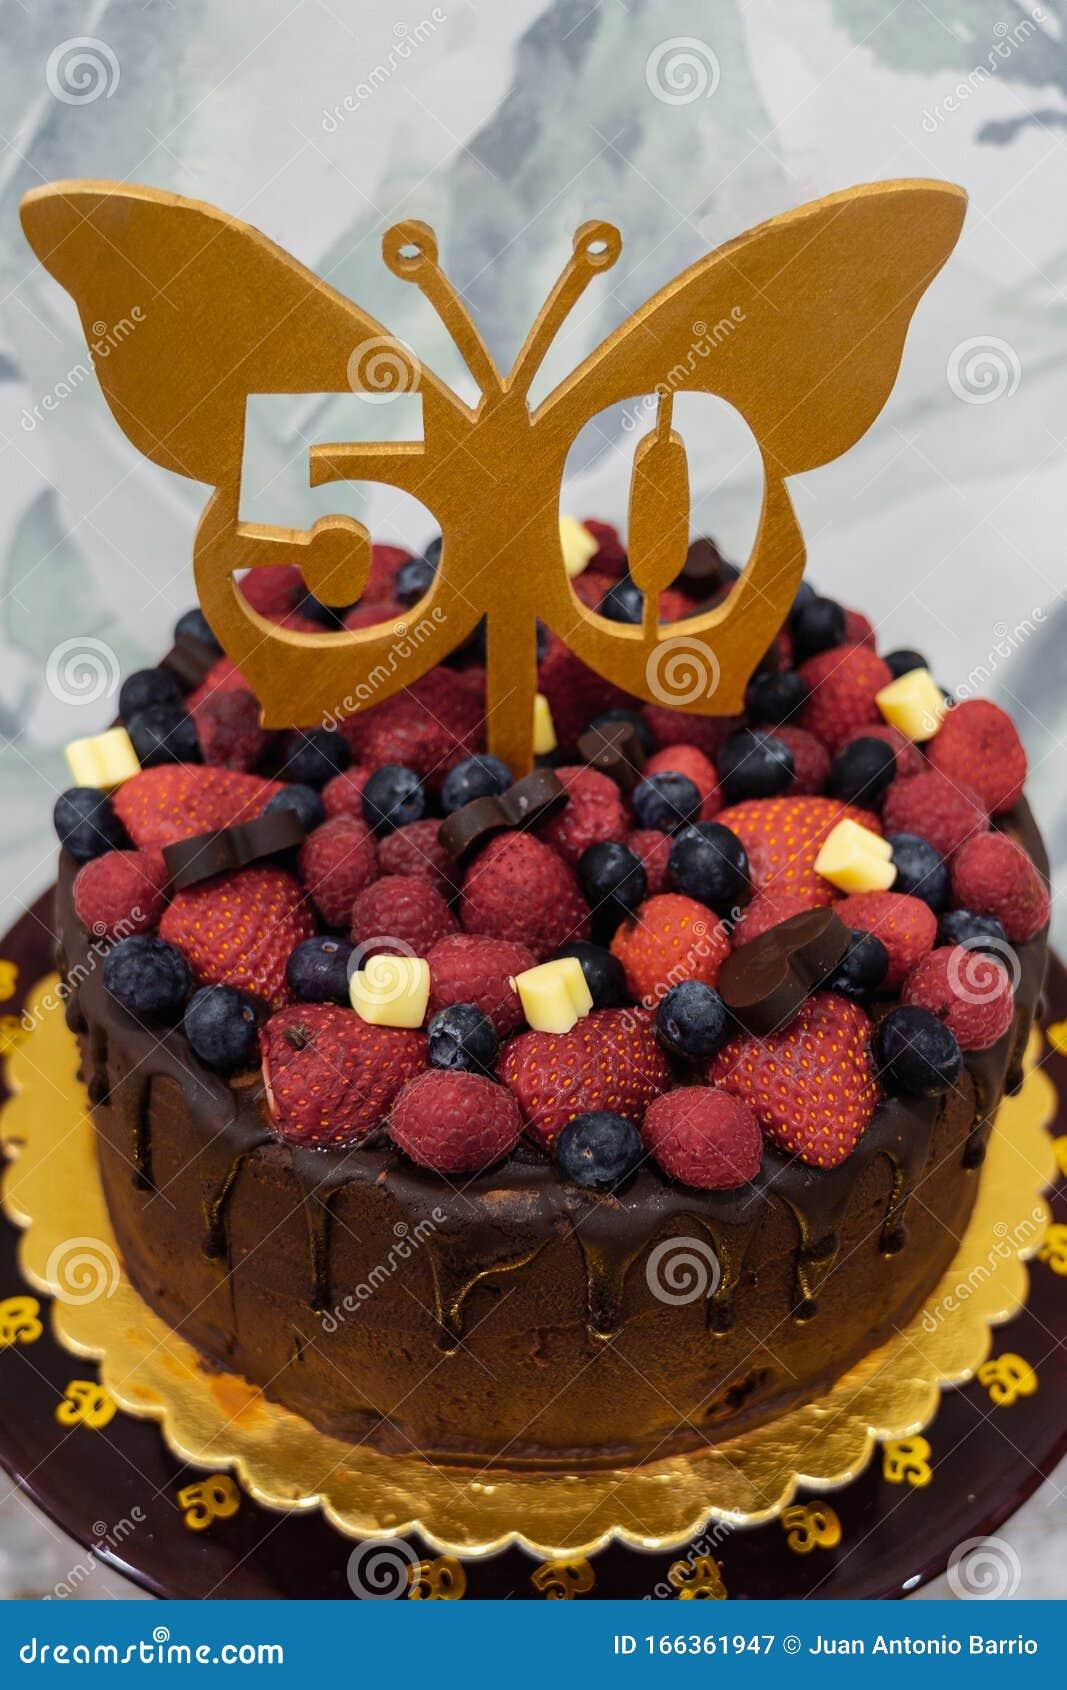 Strange 50Th Birthday Cake With Chocolate Strawberries And Blueberries Personalised Birthday Cards Arneslily Jamesorg